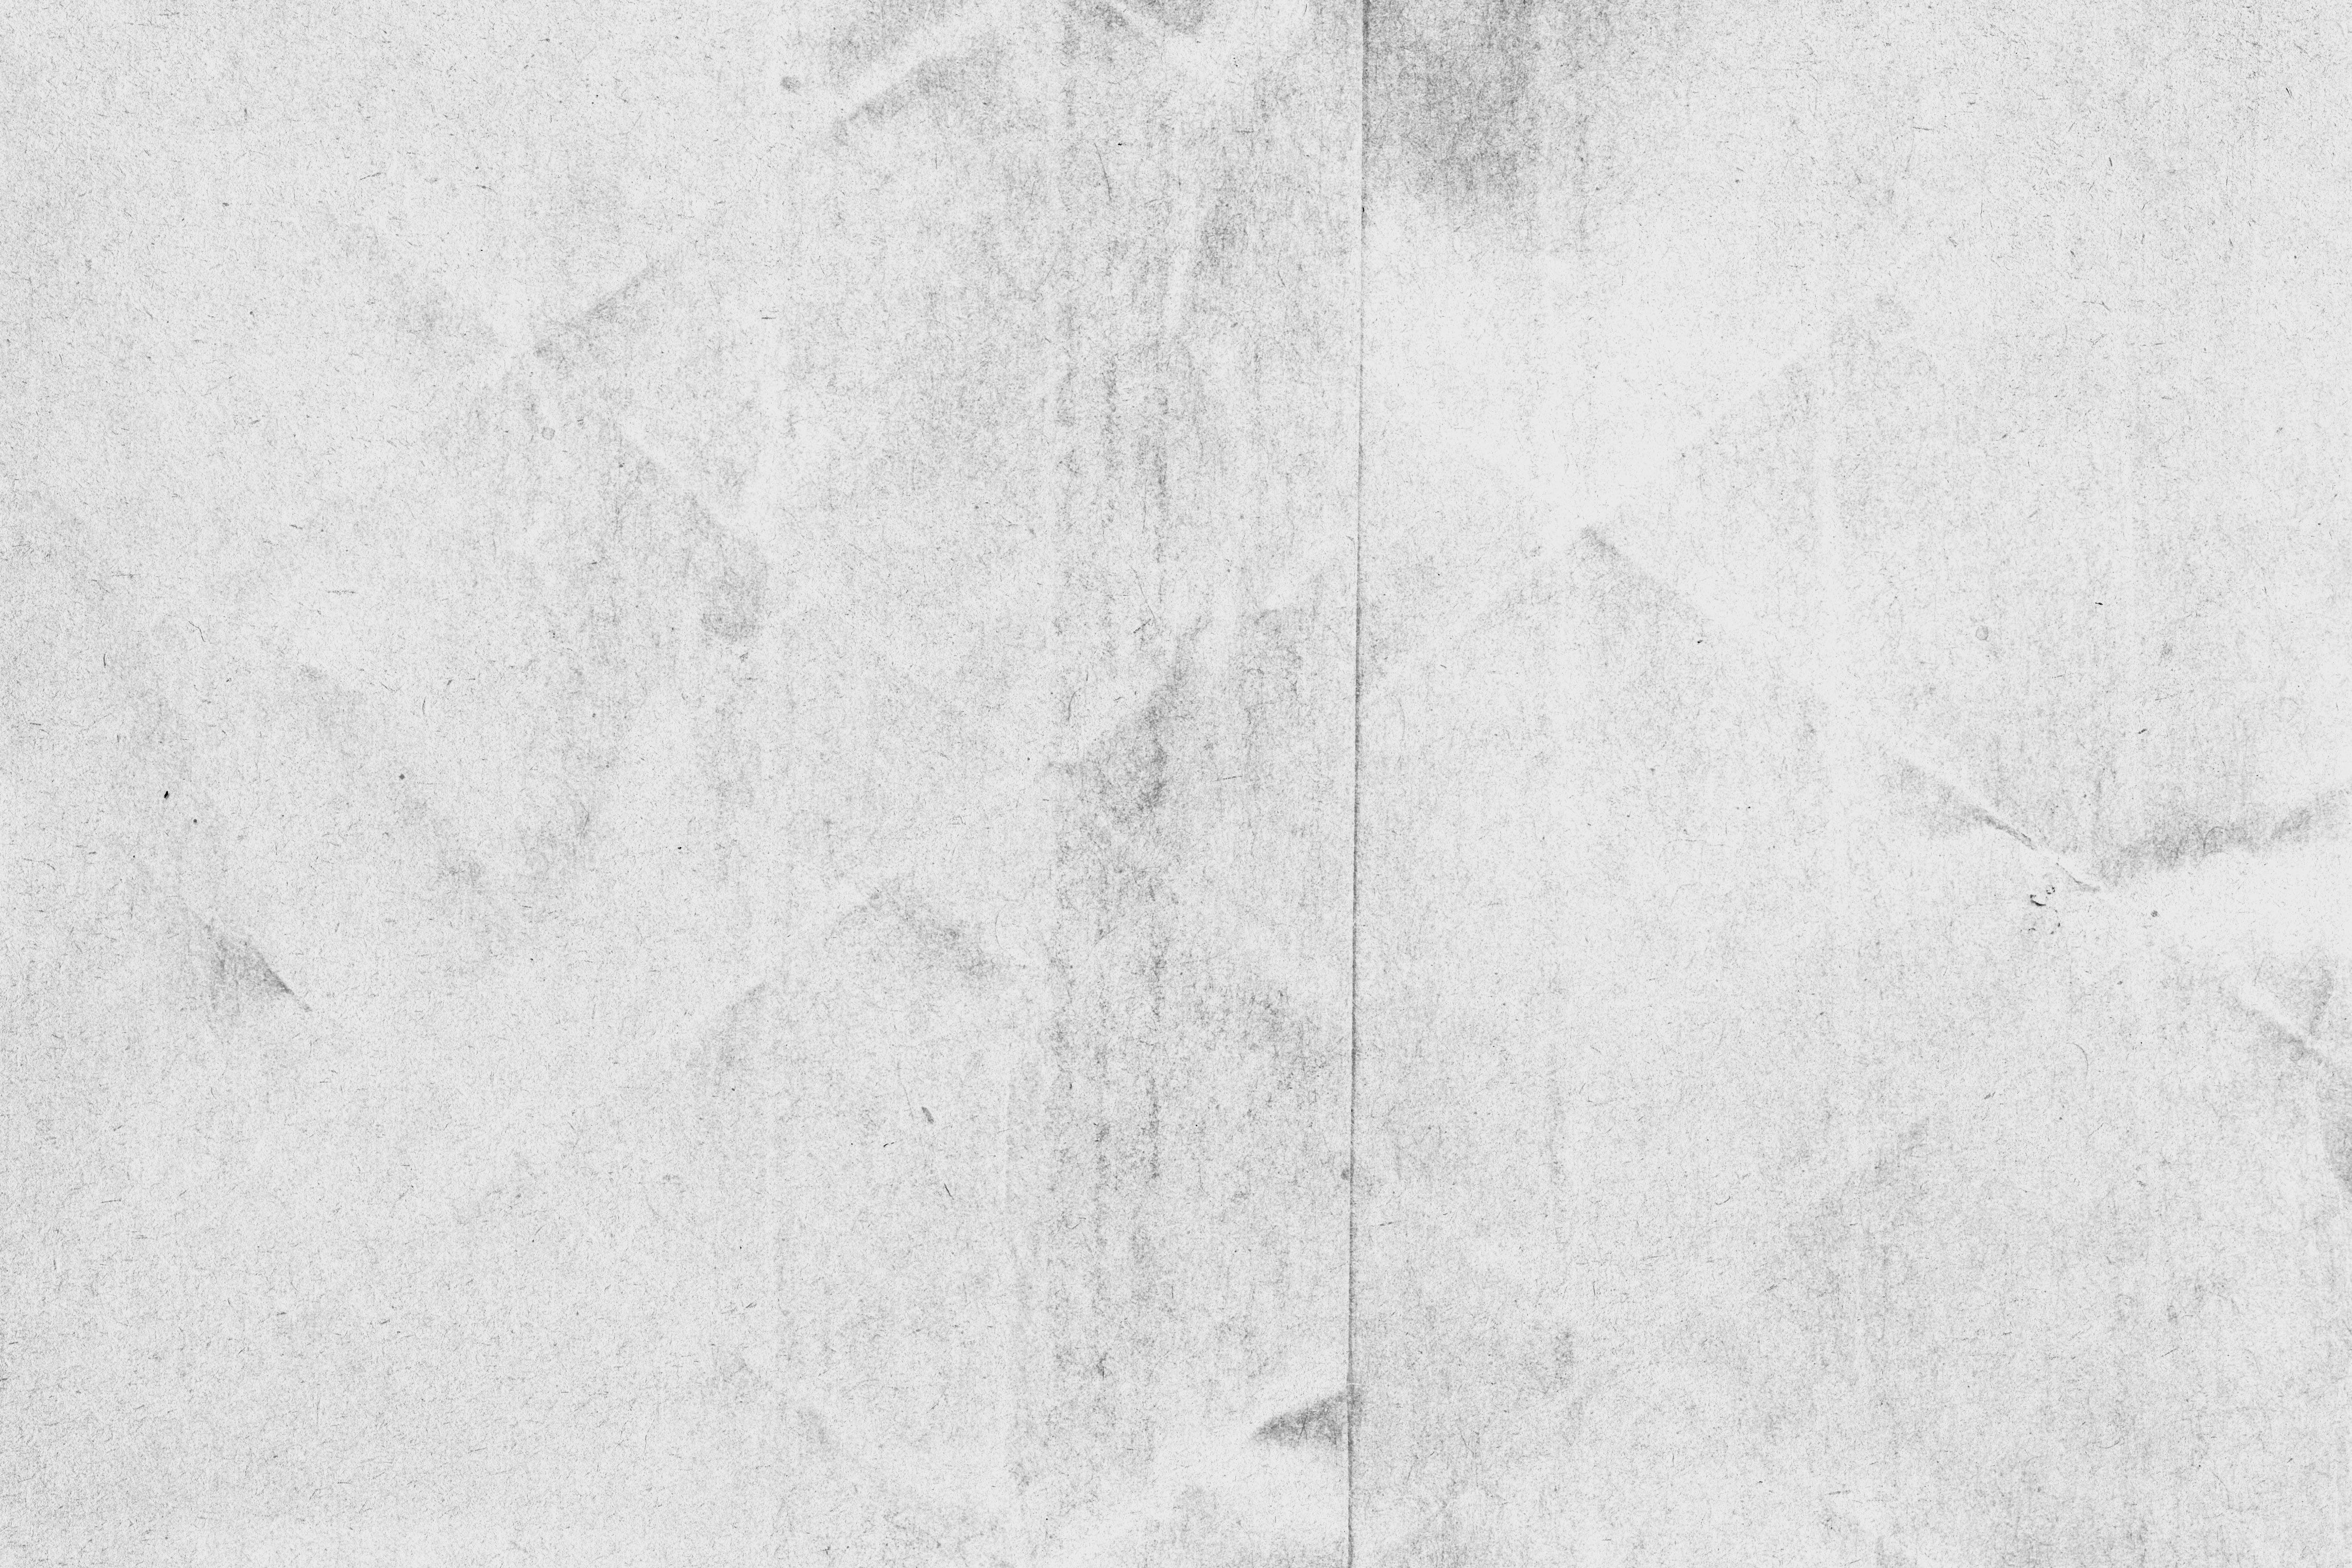 whitegrungetextures1.jpg (4500×3000) Horror Movie